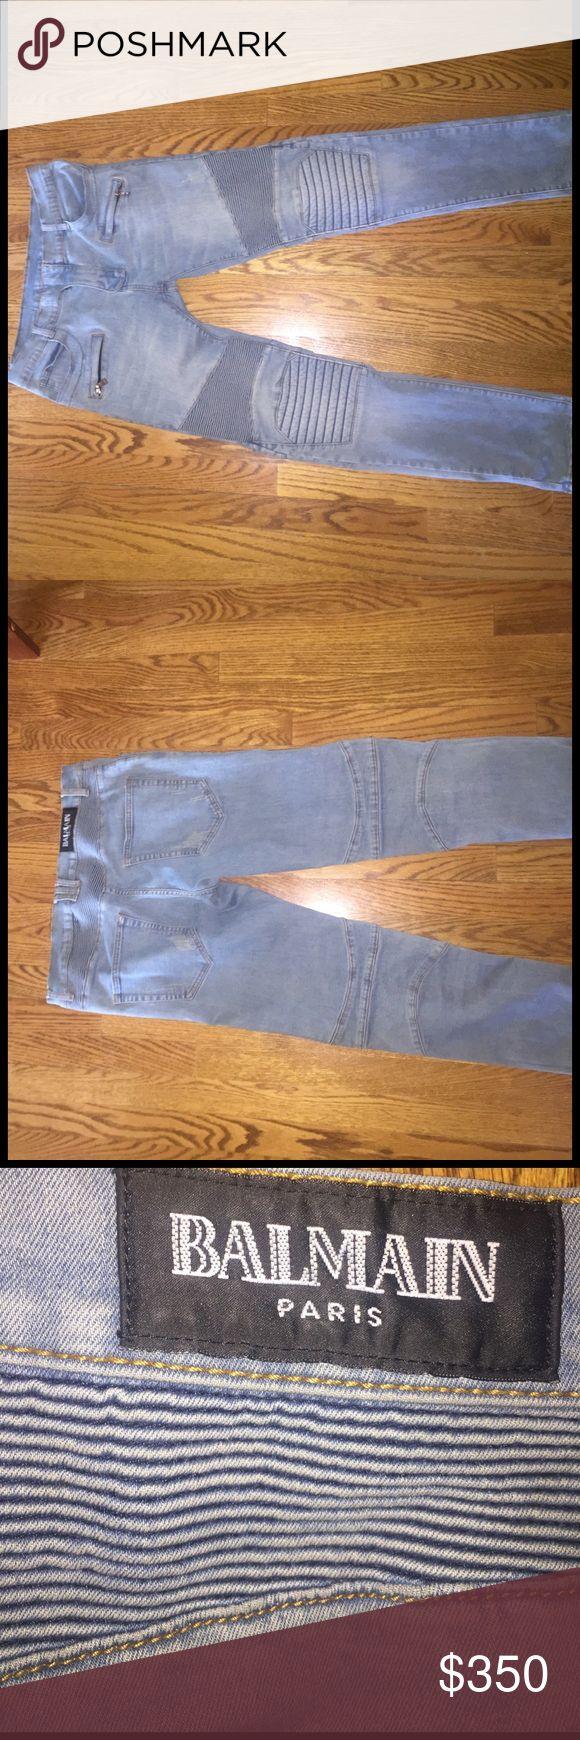 Balmain Jeans giving away for cheap. Light Blue Jeans Size 32 Balmain Jeans Skinny